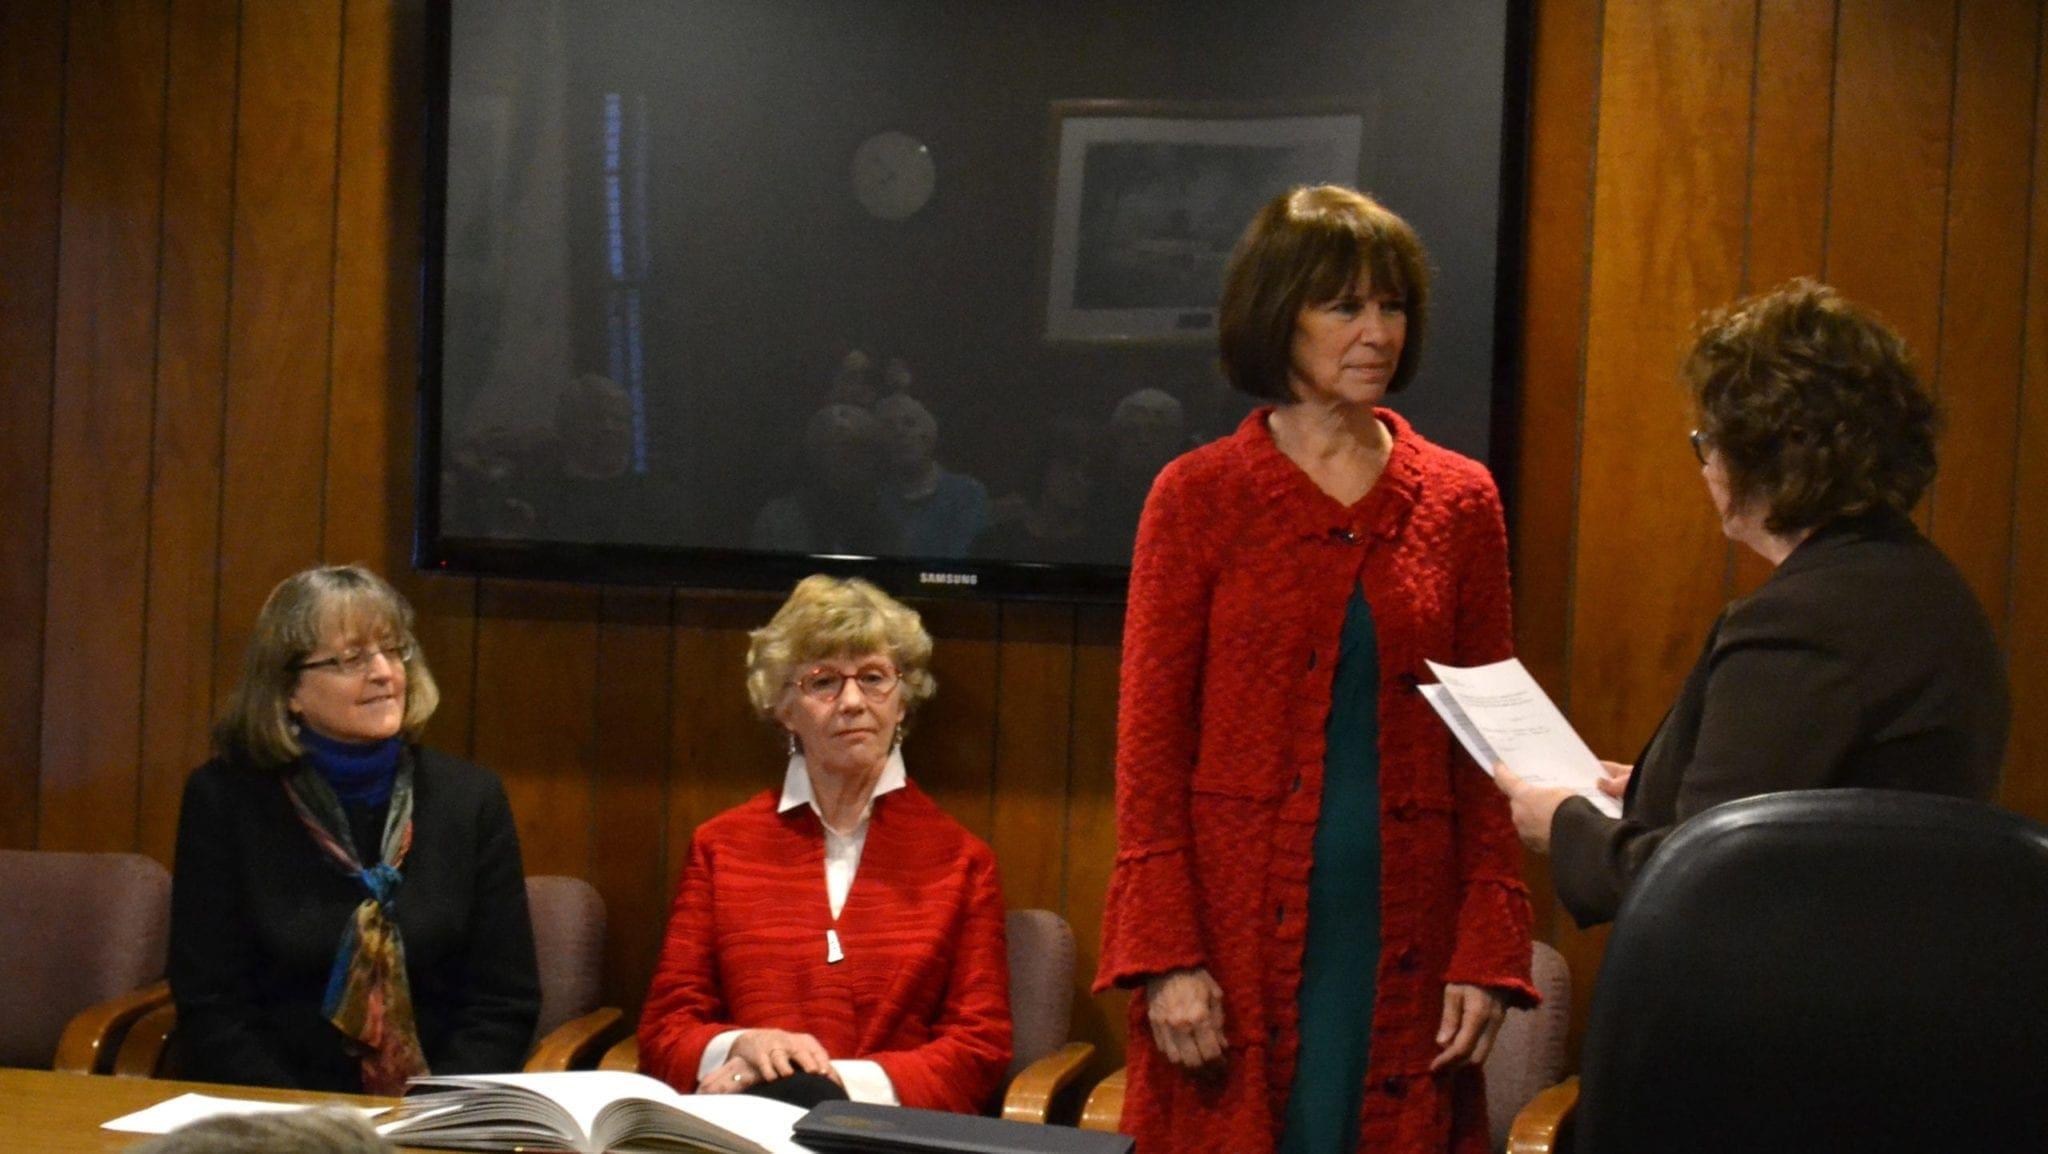 Skaneateles electees prepare to start terms, take oaths